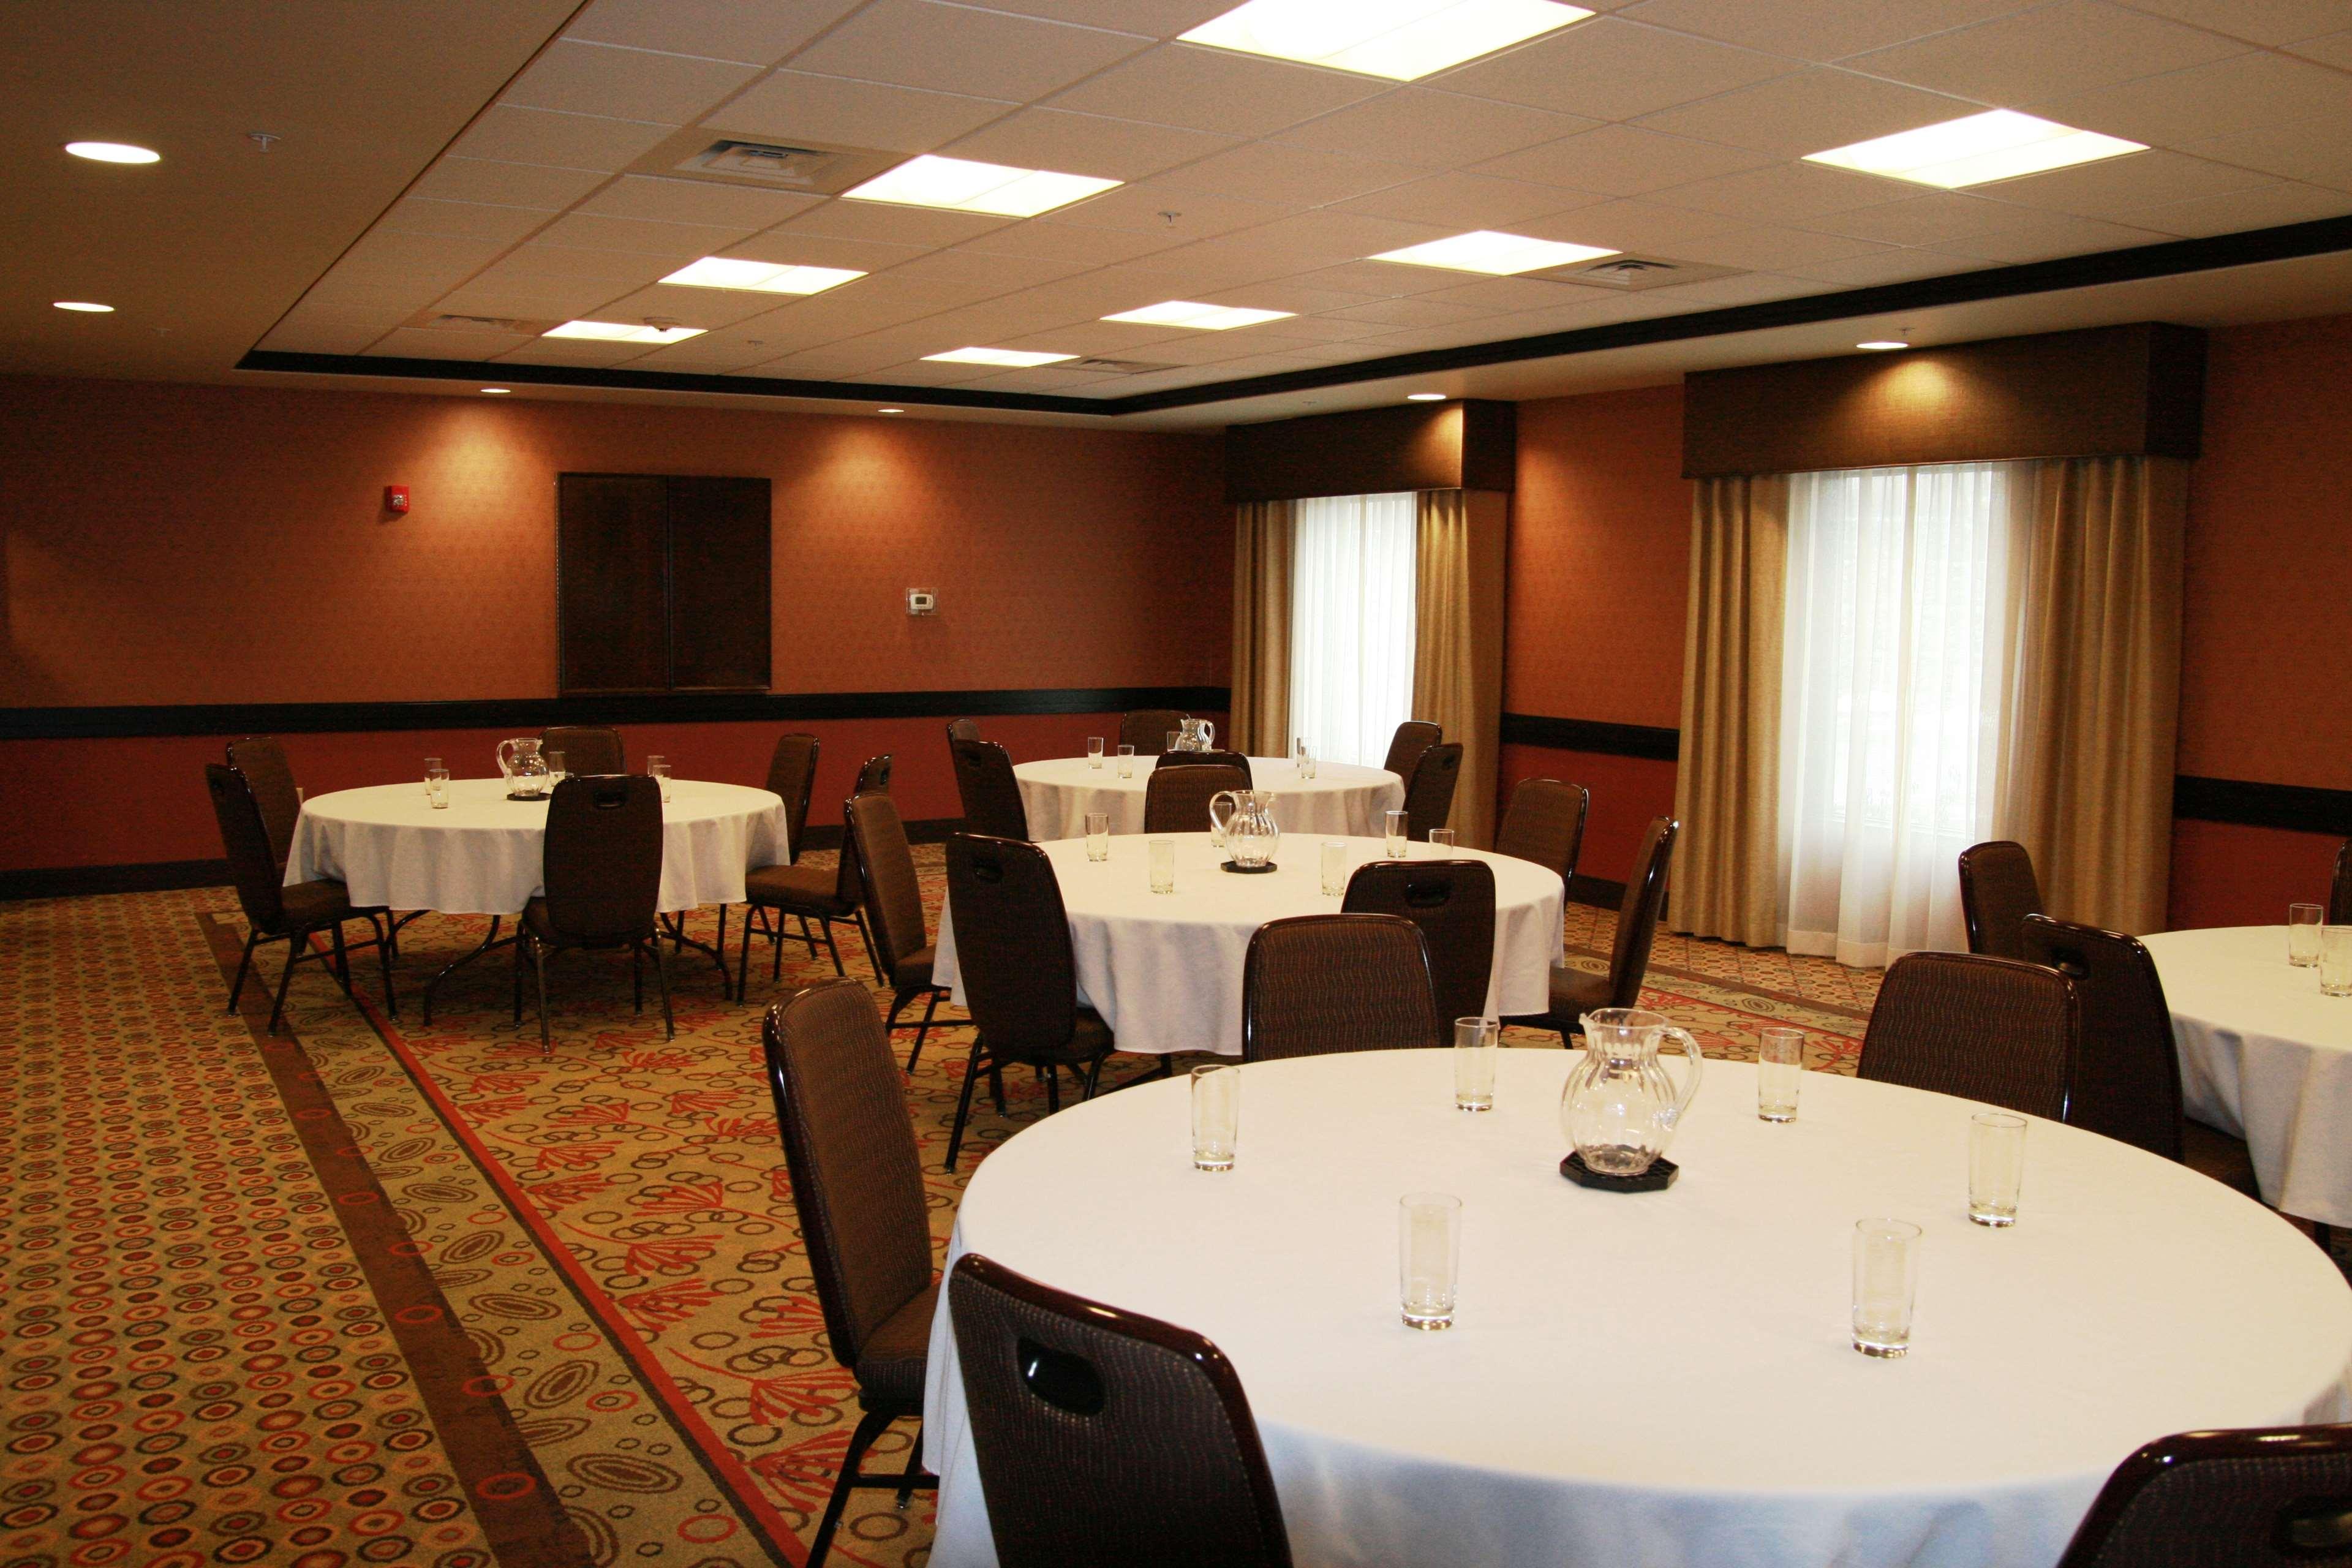 Hampton Inn & Suites Spokane Valley image 35